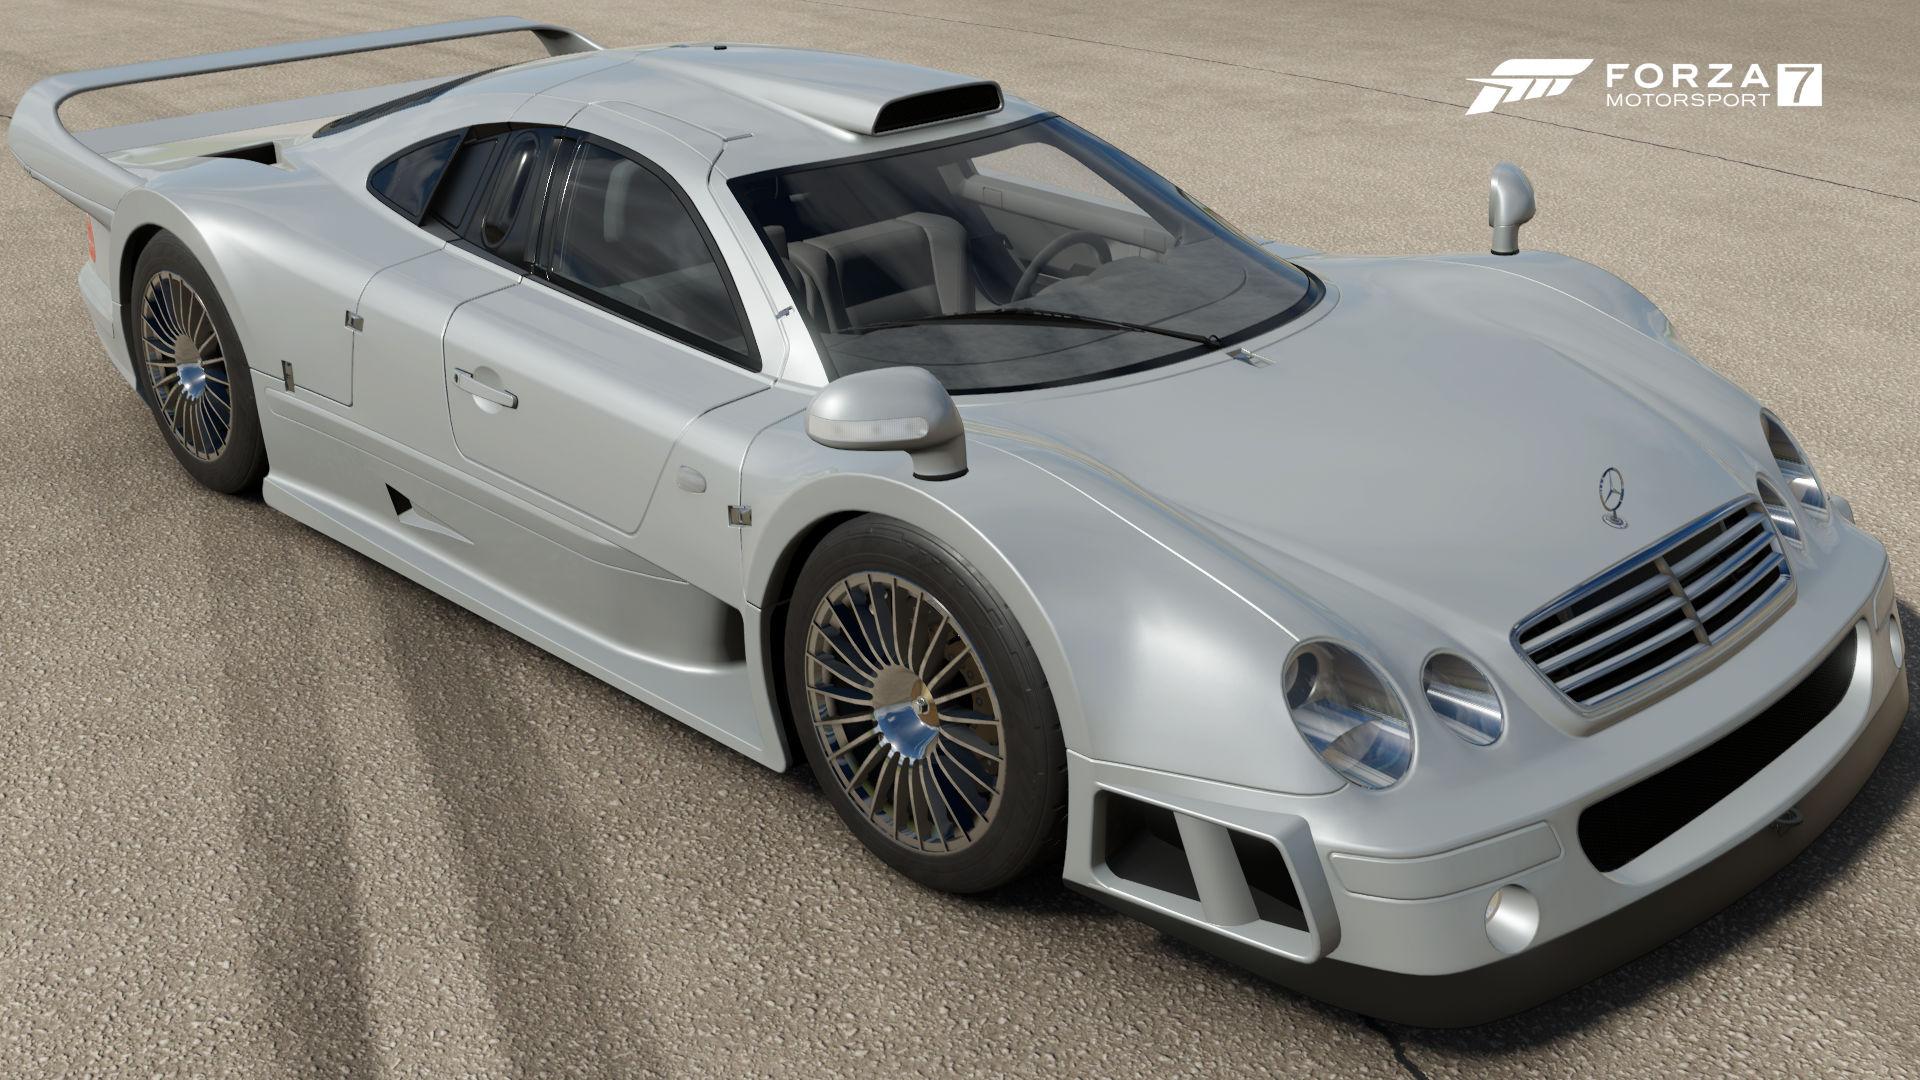 Mercedes Benz Amg Clk Gtr Forza Motorsport Wiki Fandom